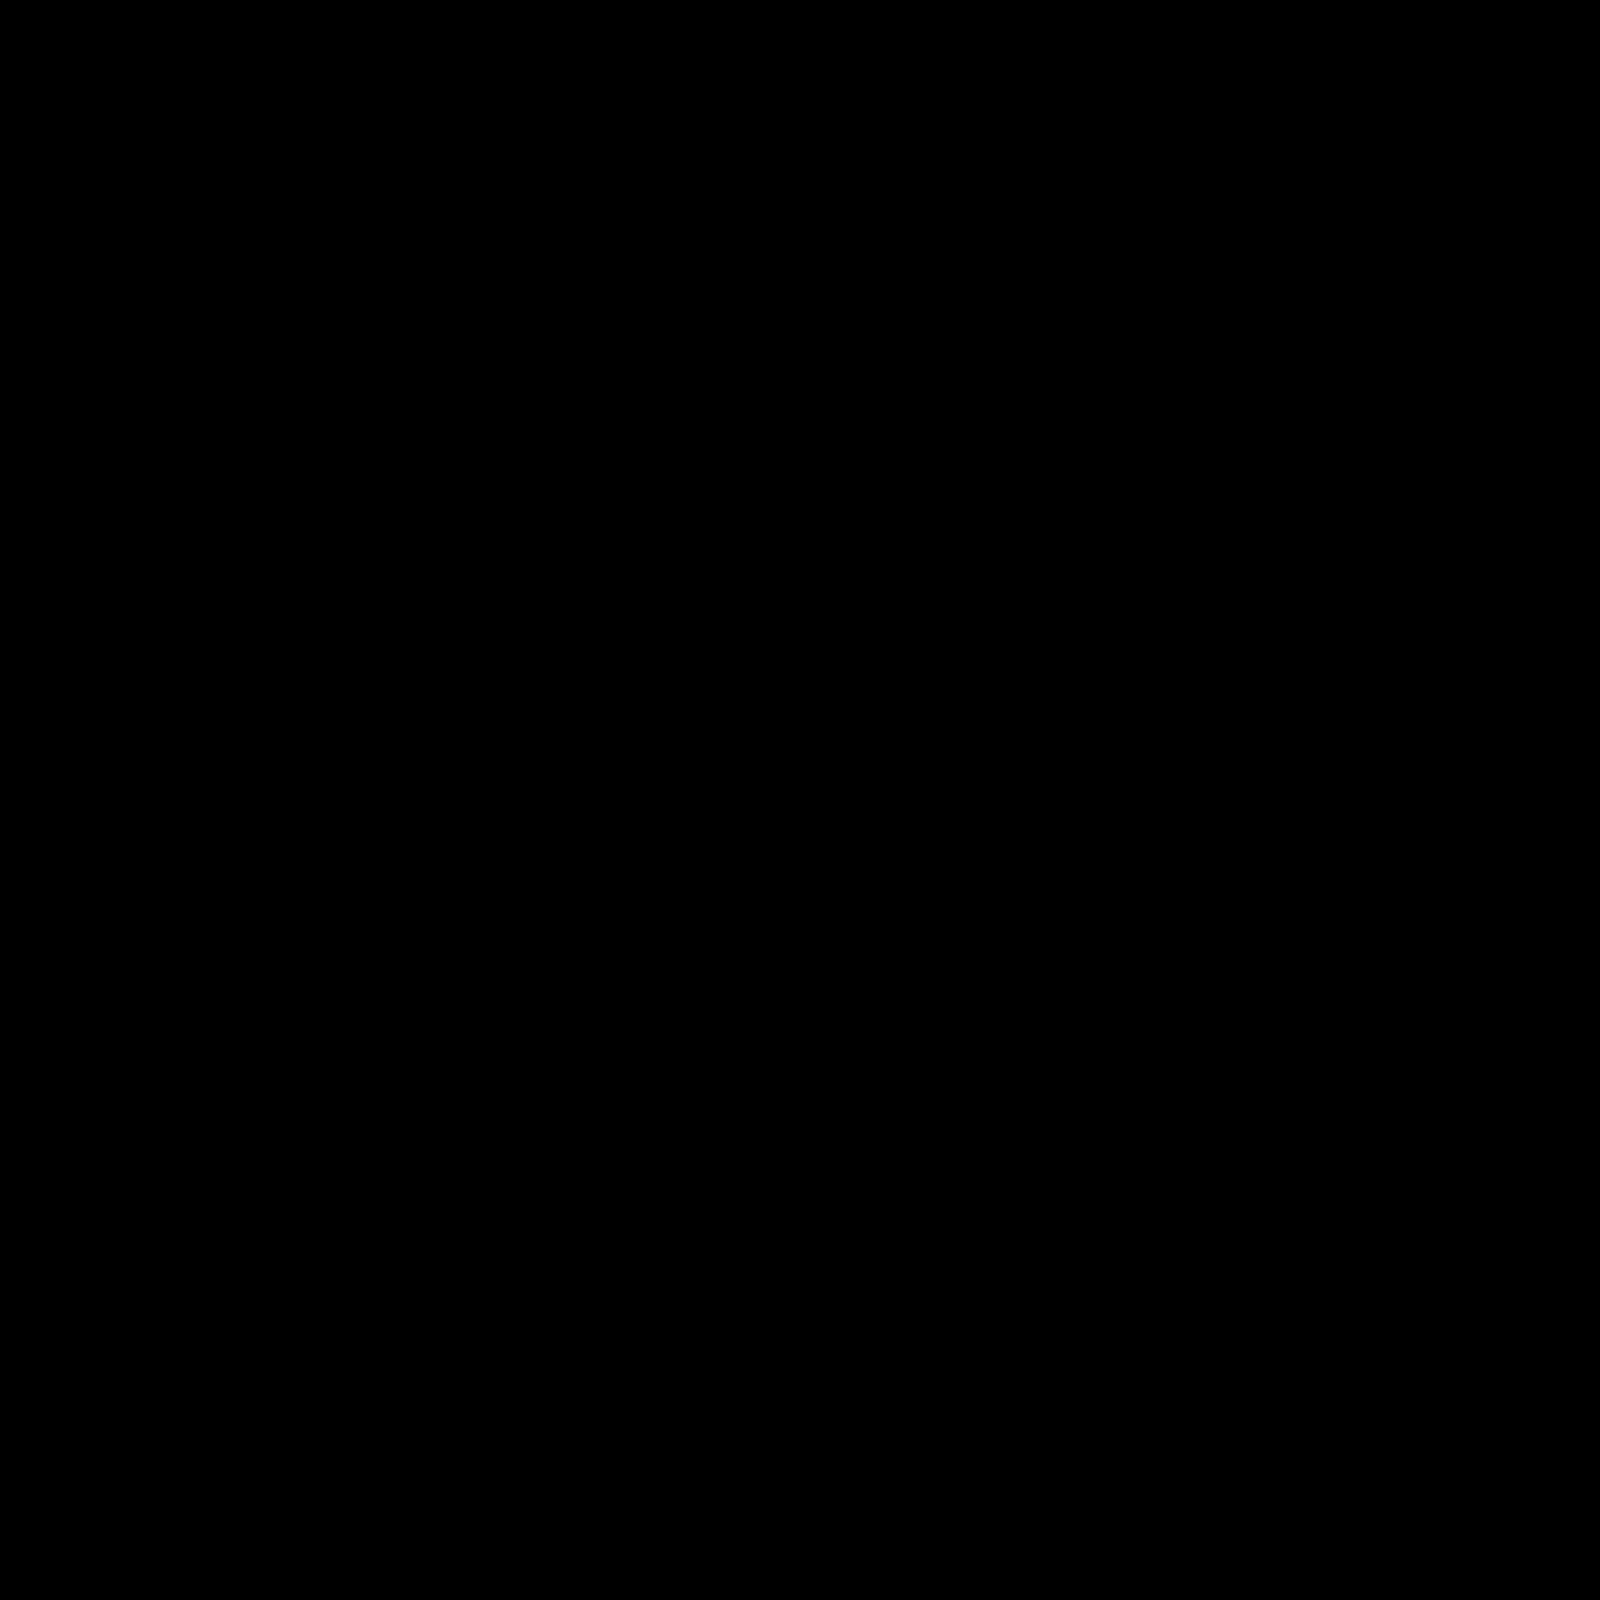 Intel ISEF icon